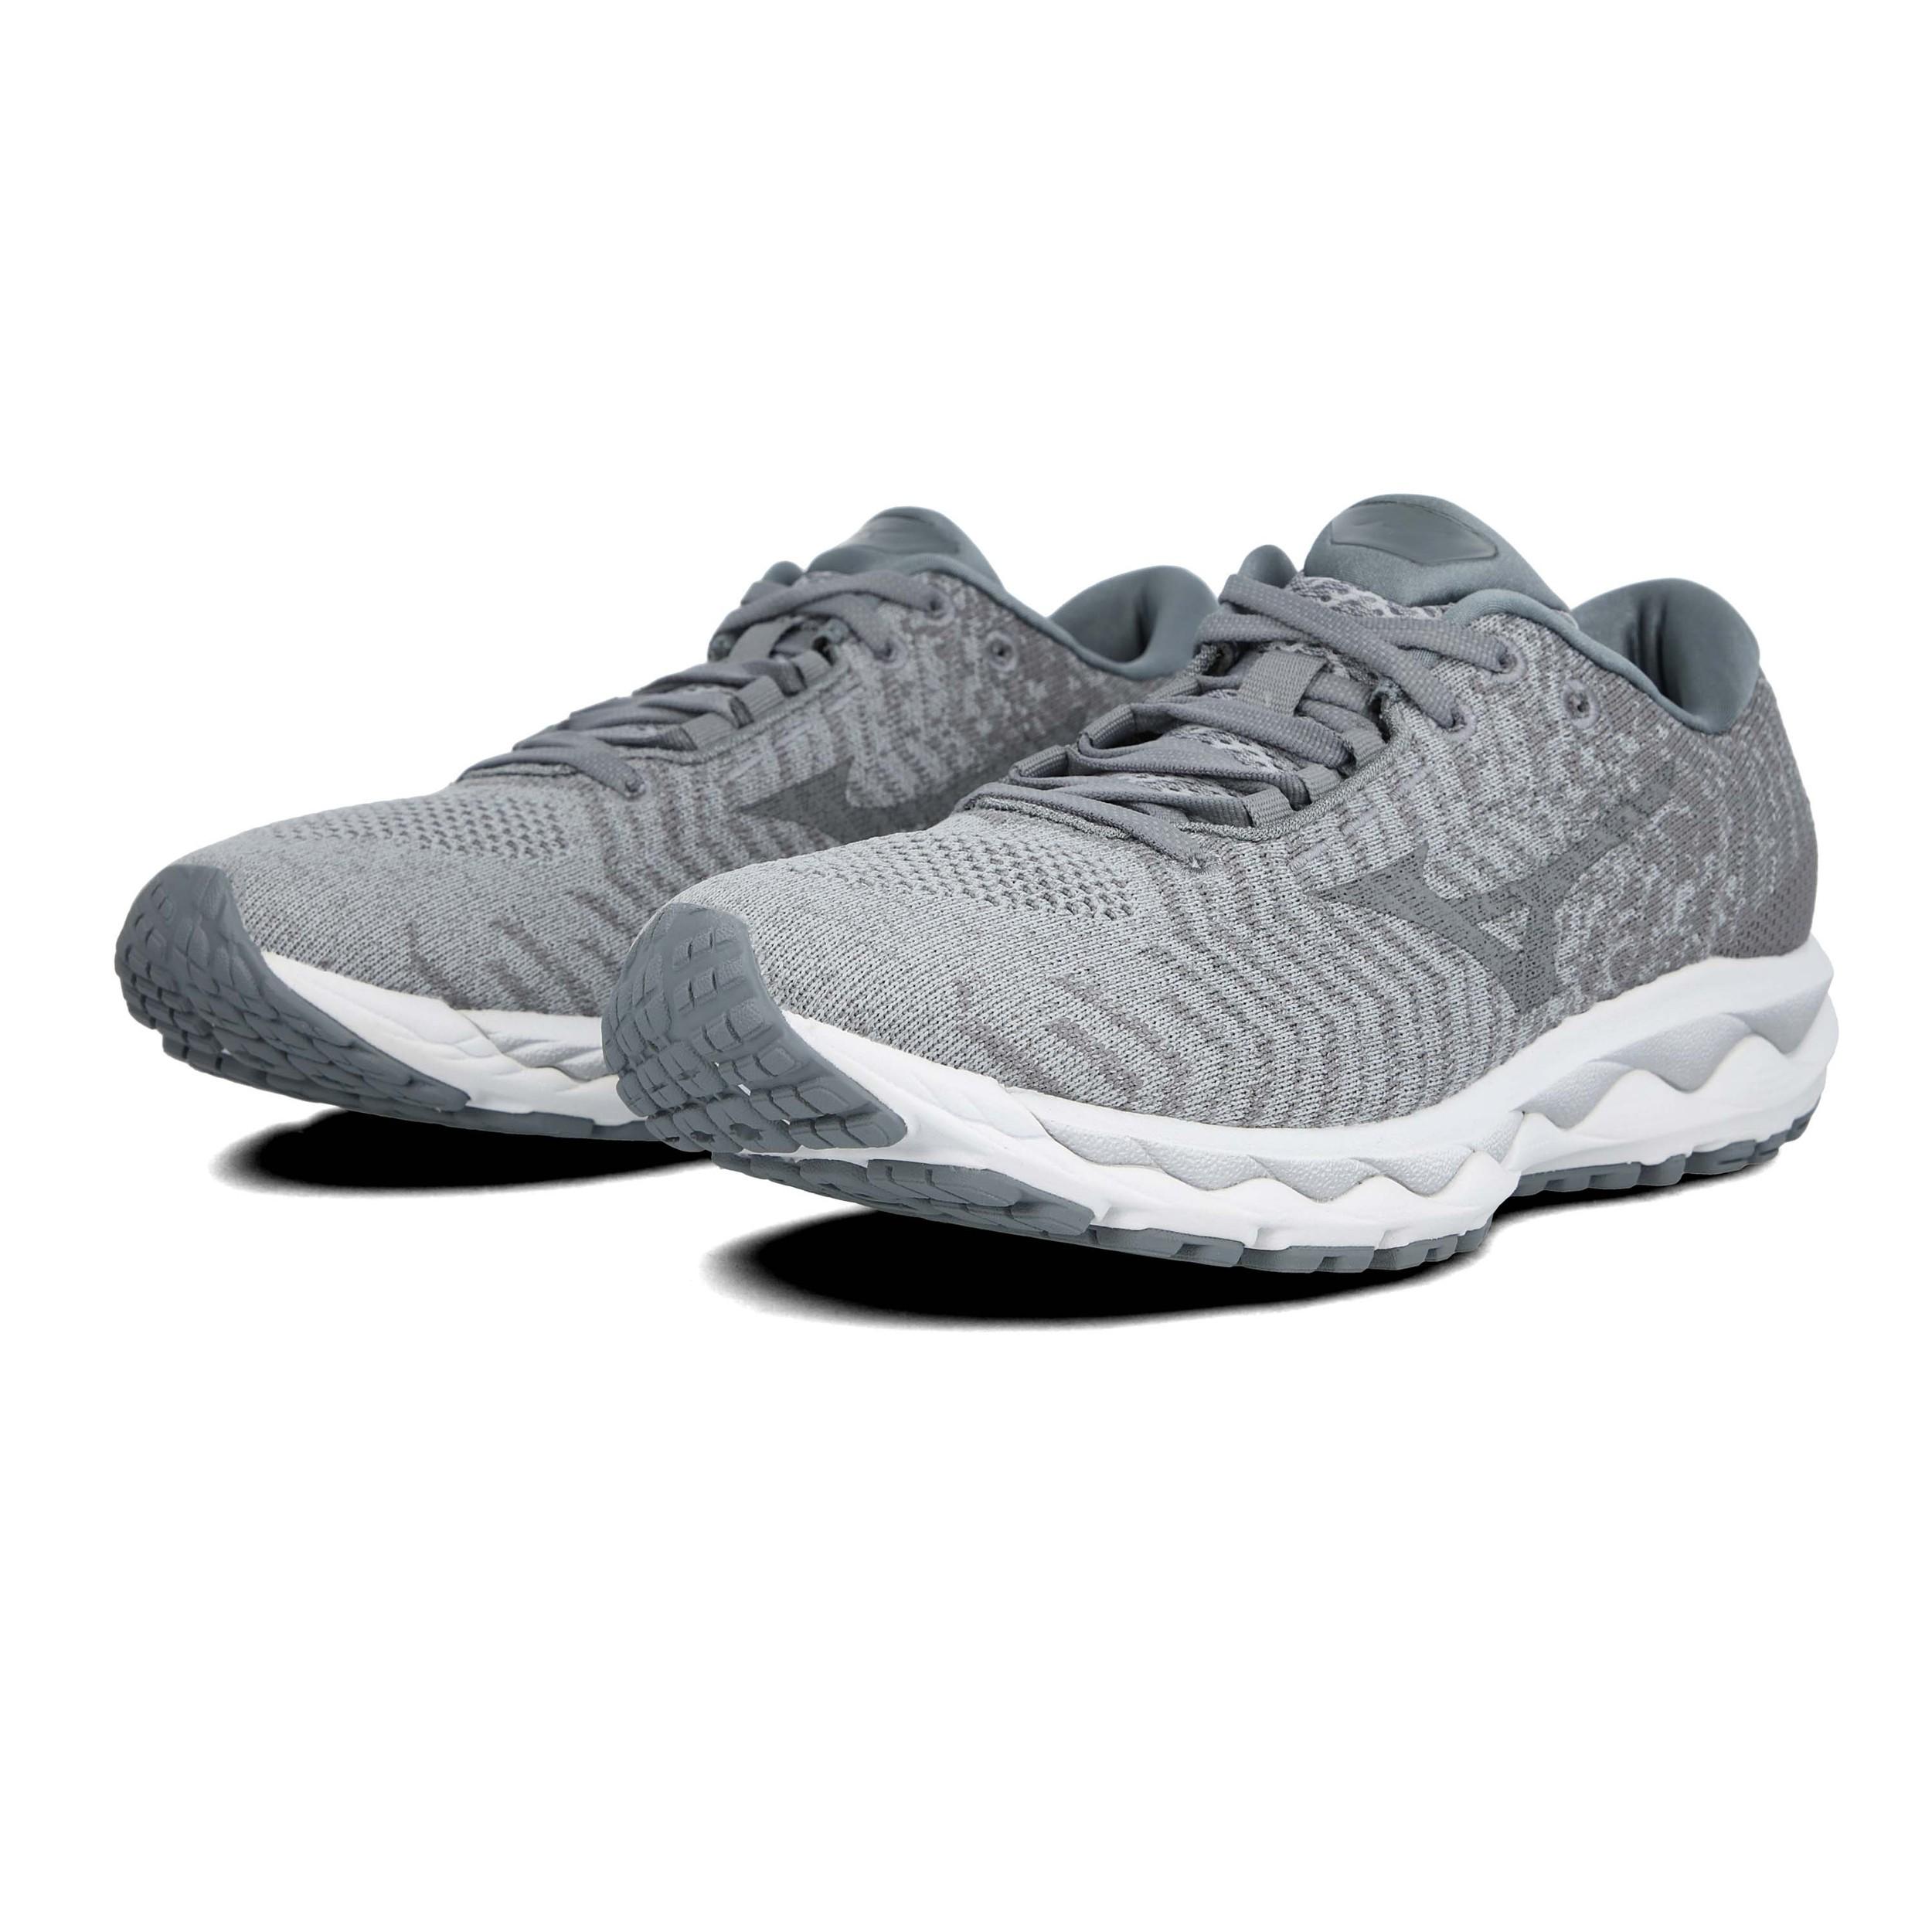 Mizuno Wave Sky Waveknit 3 Running Shoes - SS20